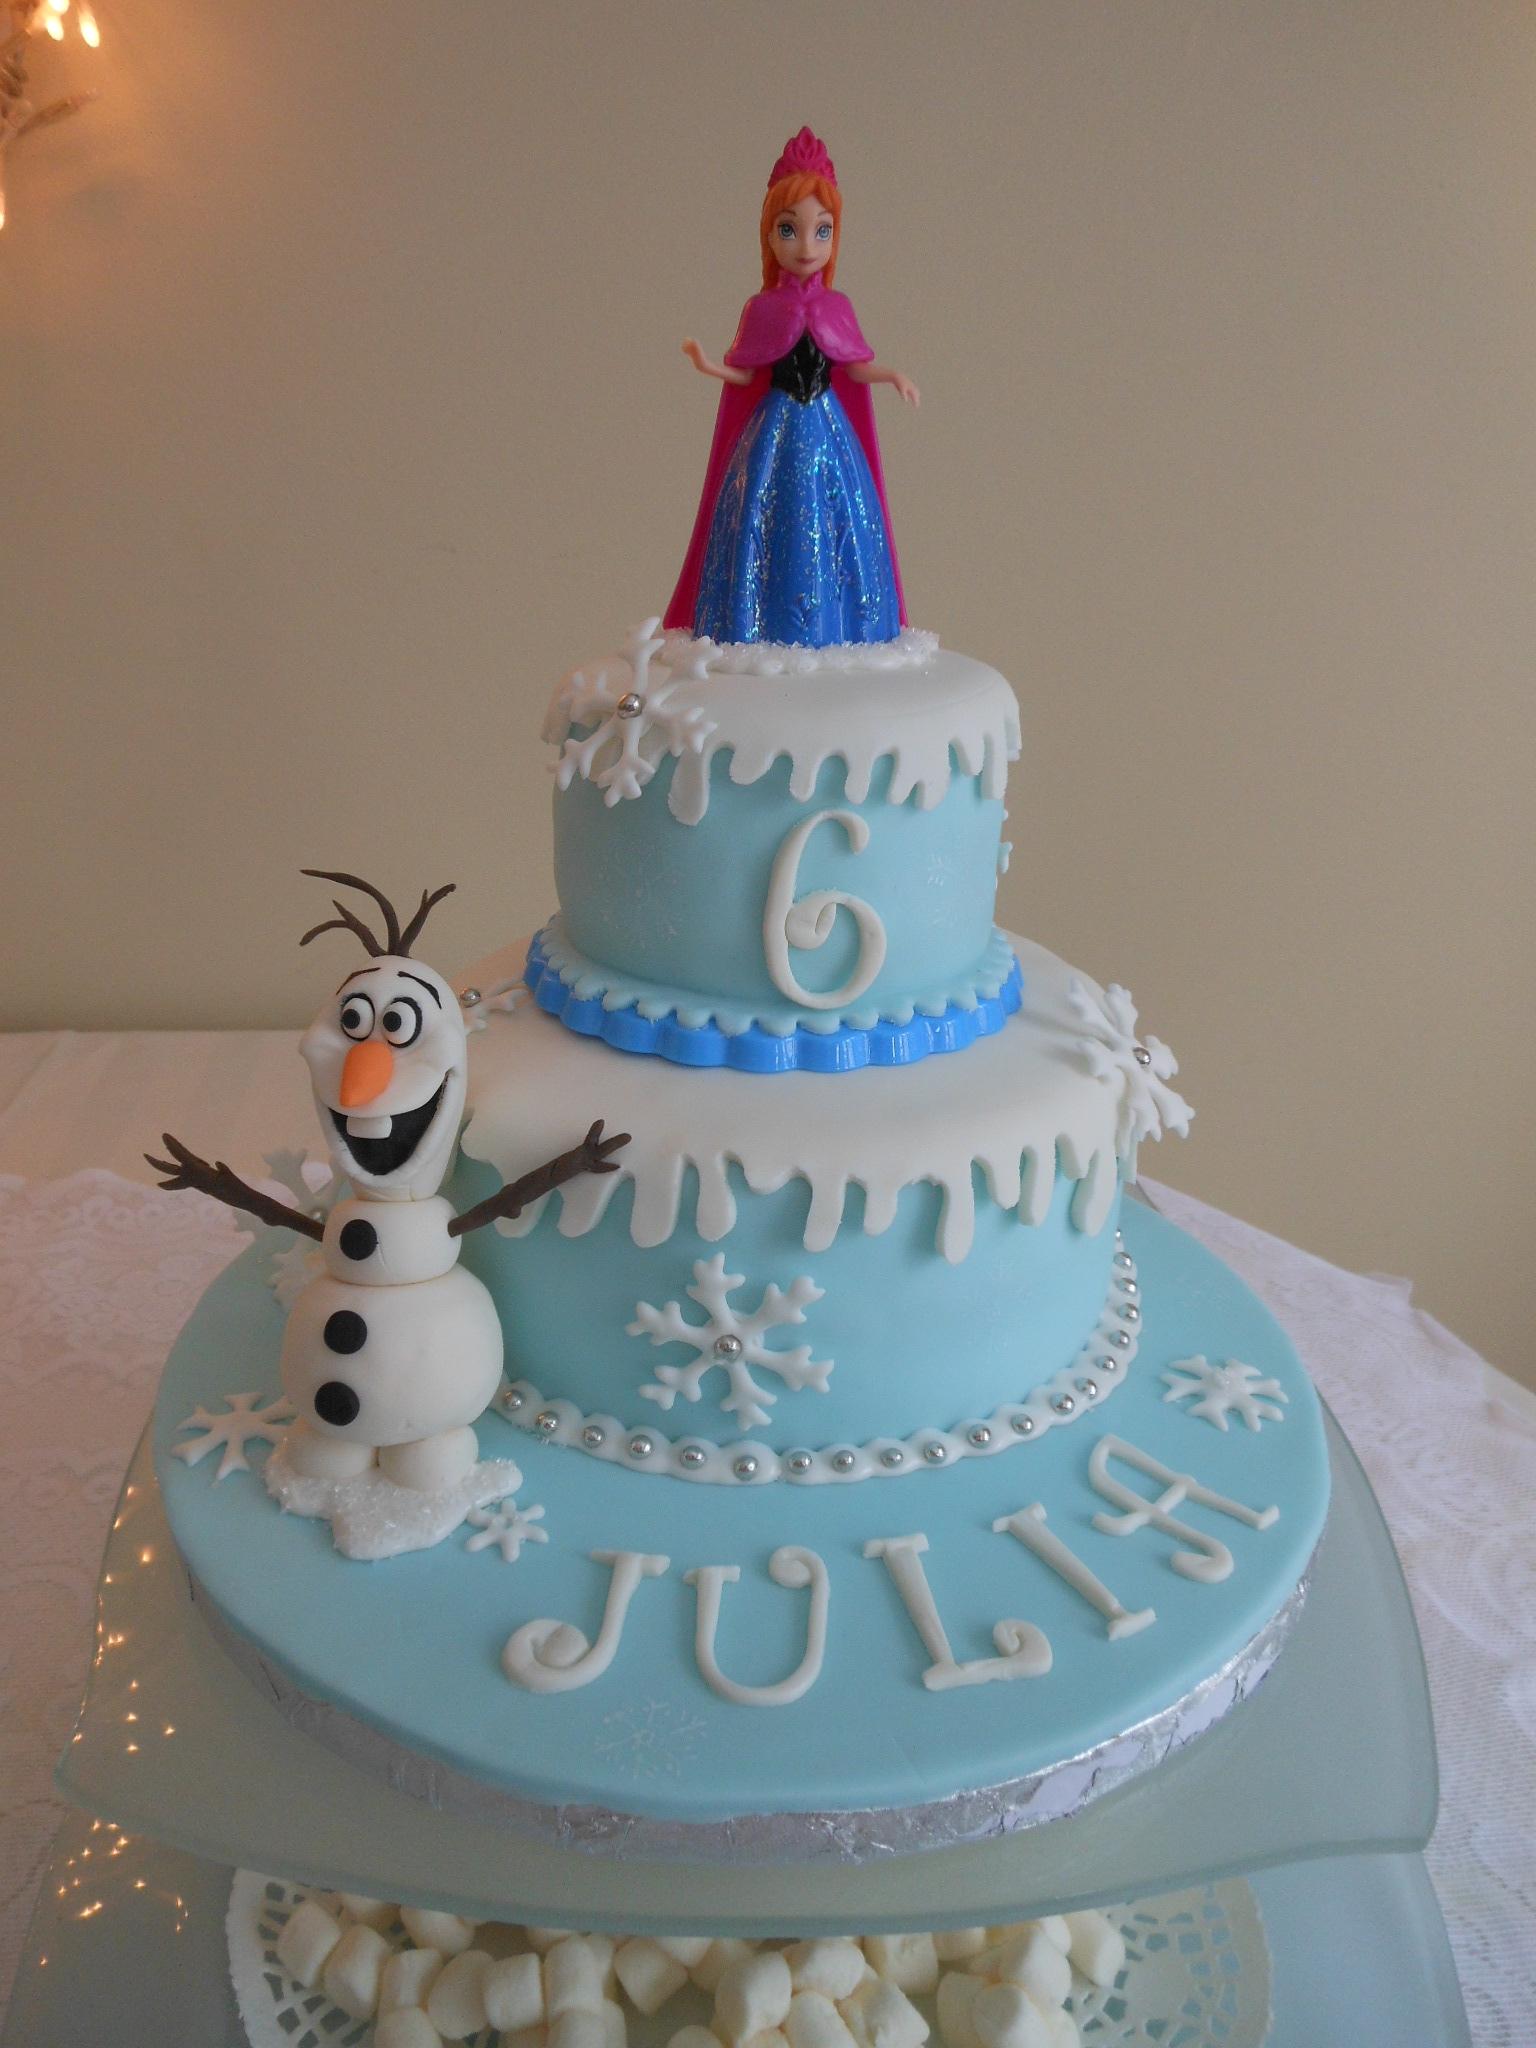 Imgenes De Elsa Birthday Cake Tesco